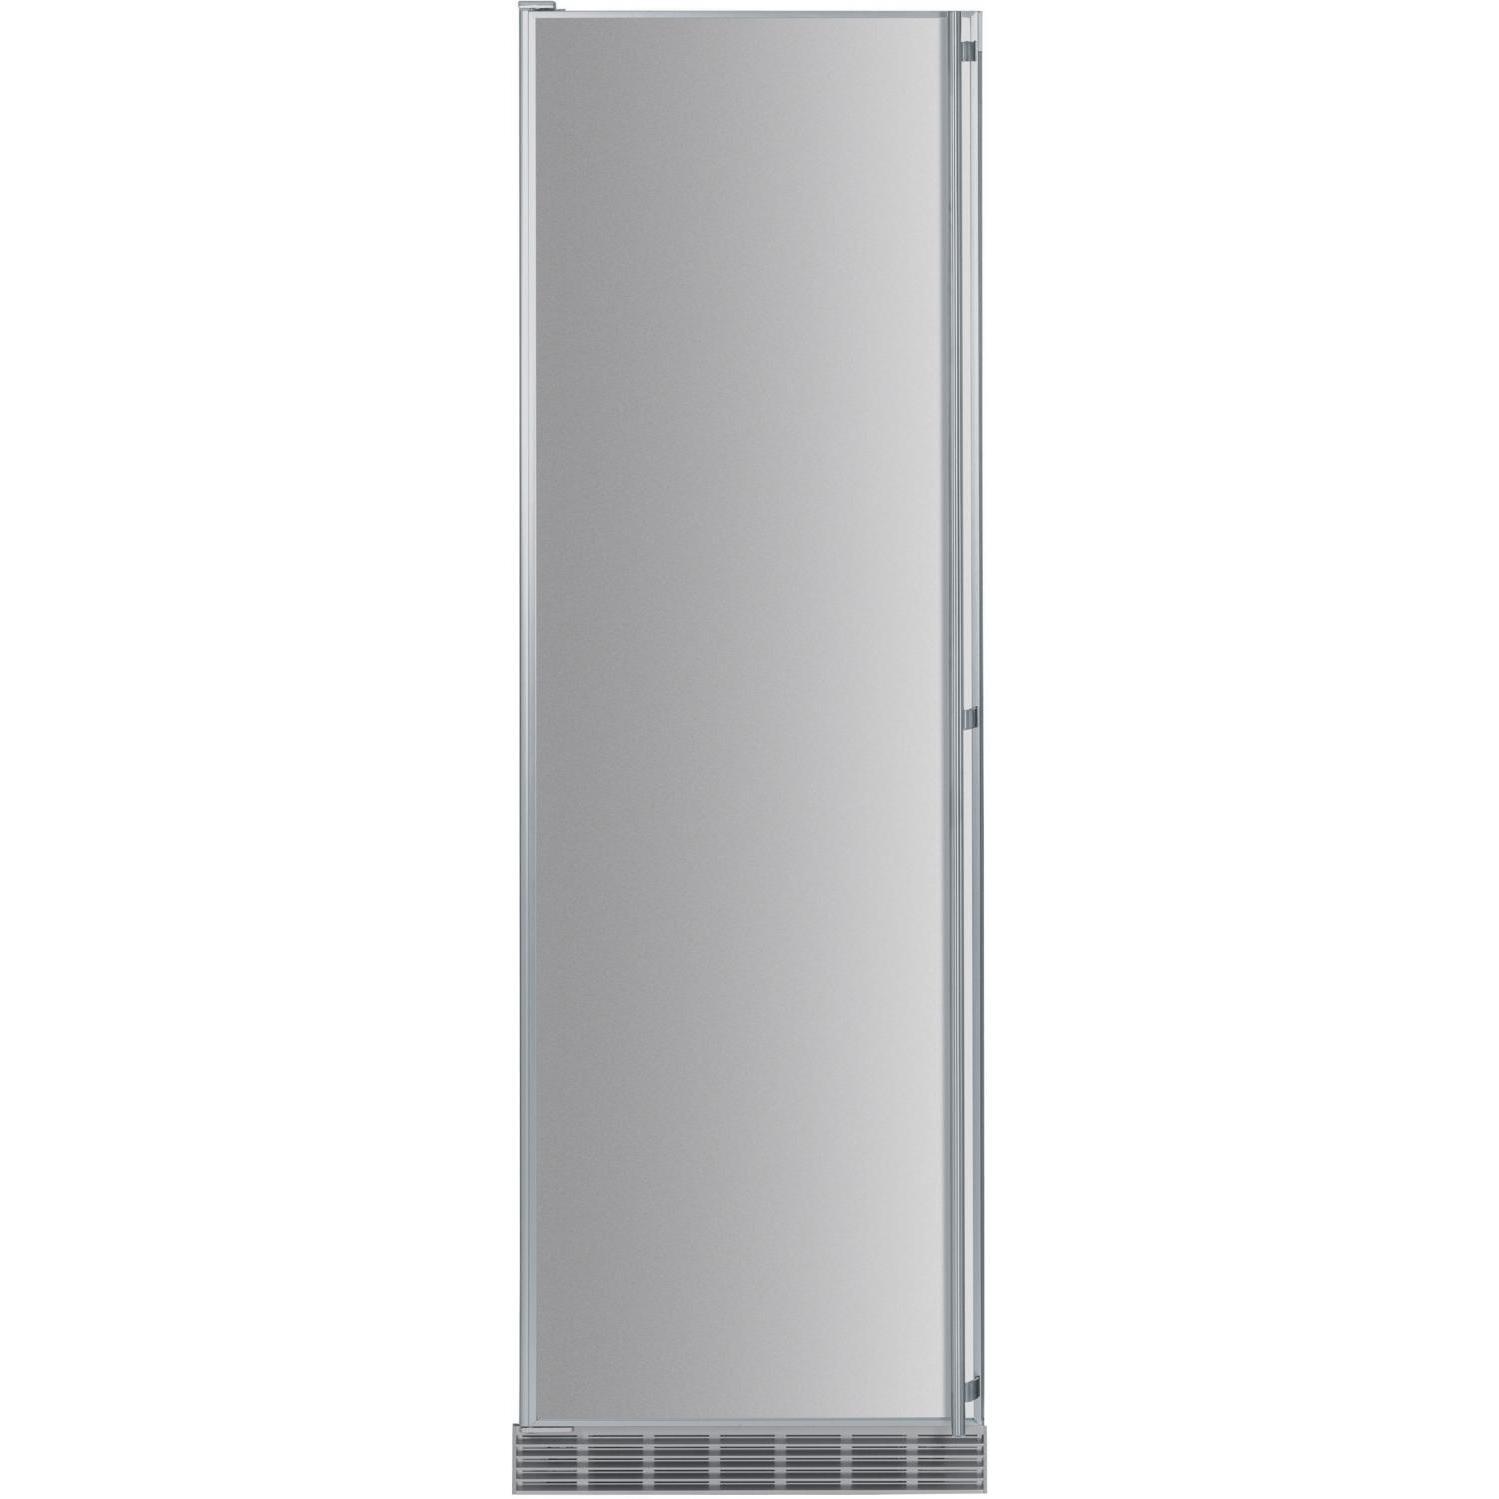 Liebherr FI-1051 9.4 Cu. Ft. Built-In Freezer With Ice Maker - Custom Panel Door / Stainless Steel Cabinet